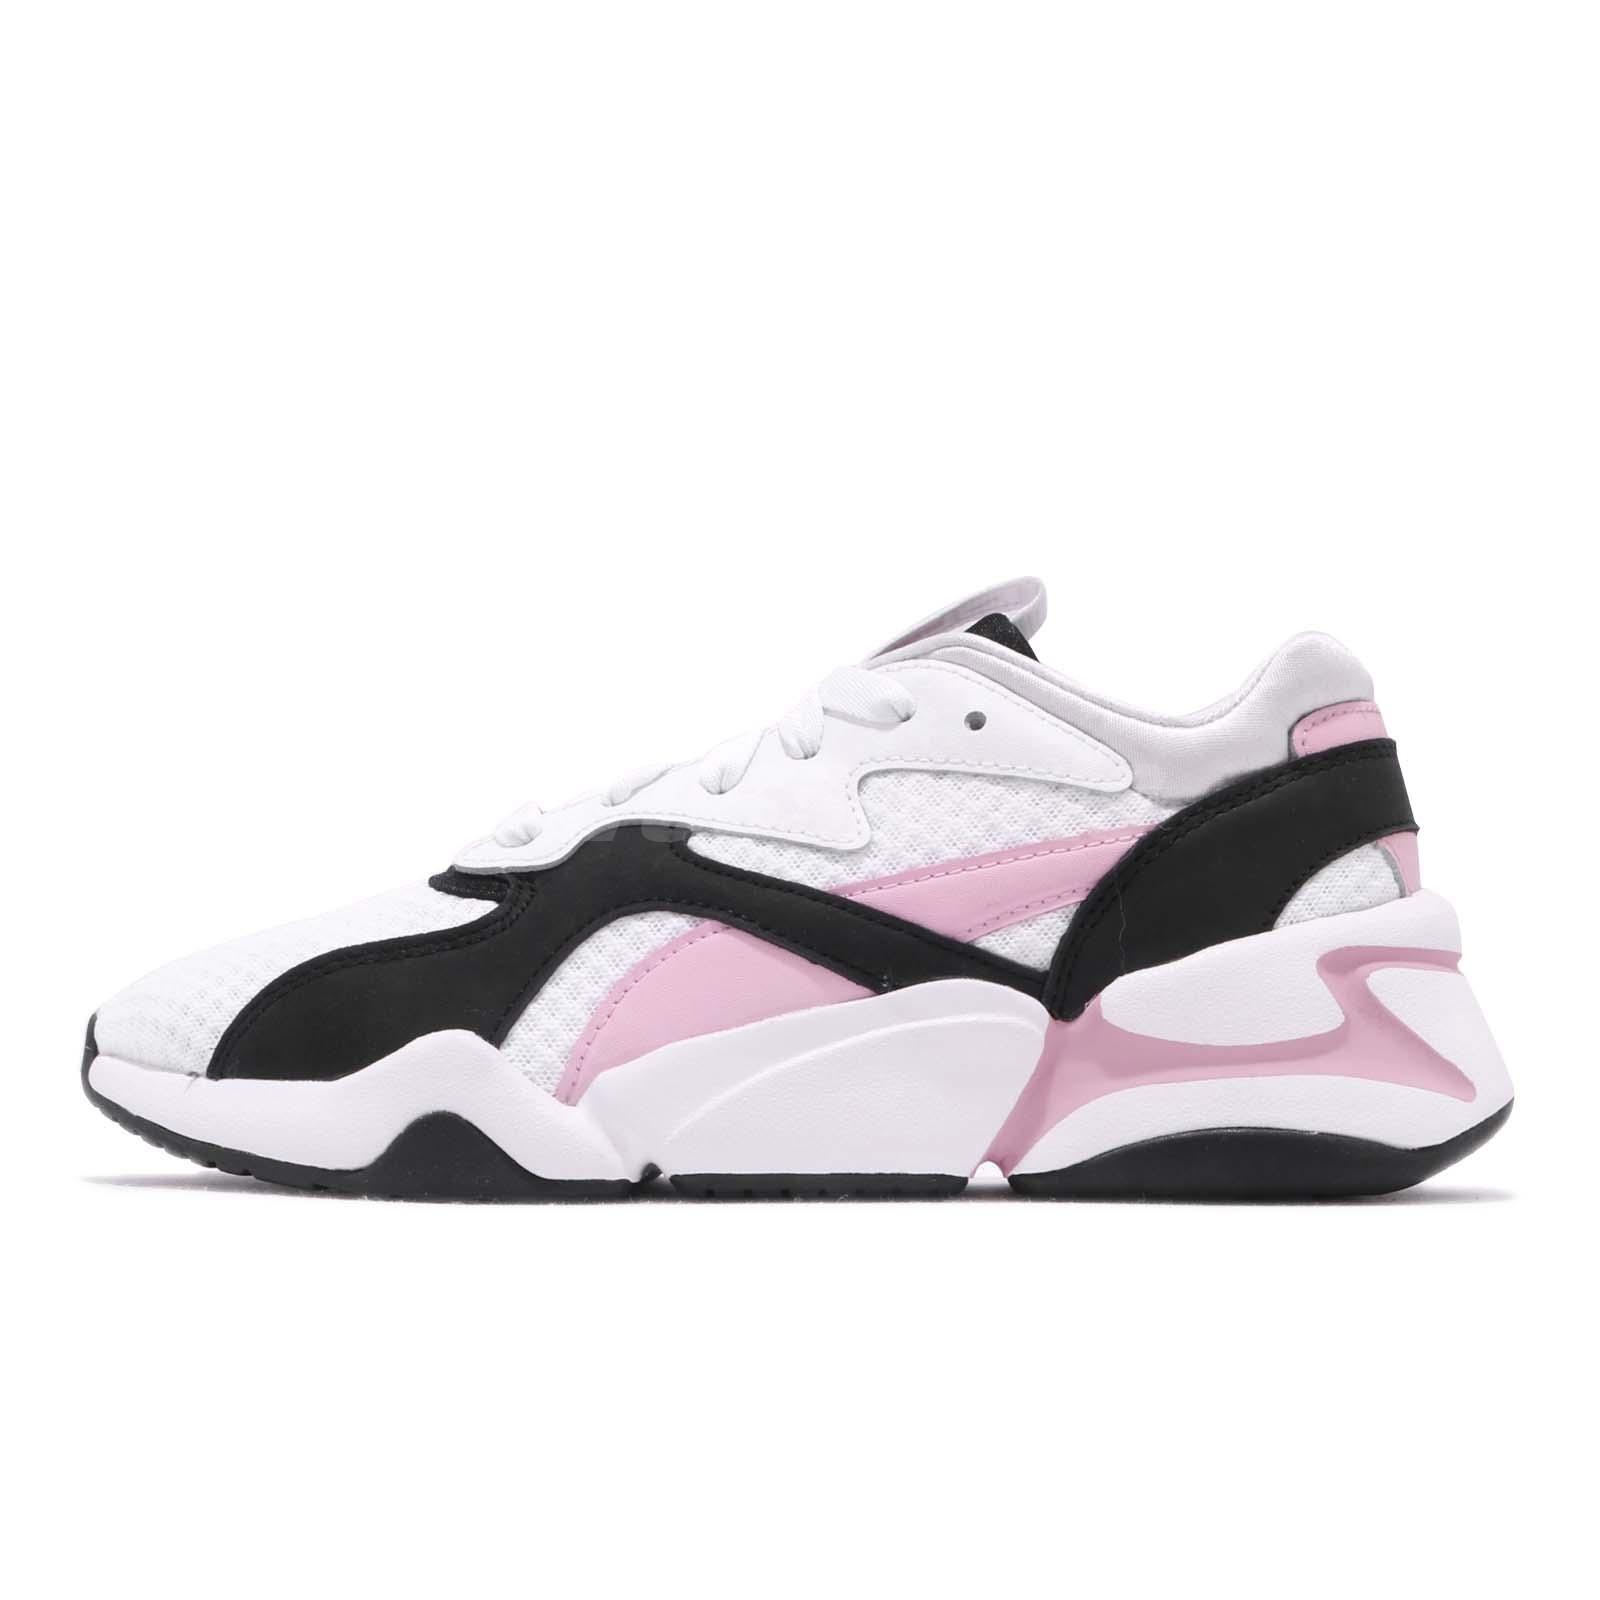 Puma Nova 90's bloc Lace Womens Running Shoes Black 369486